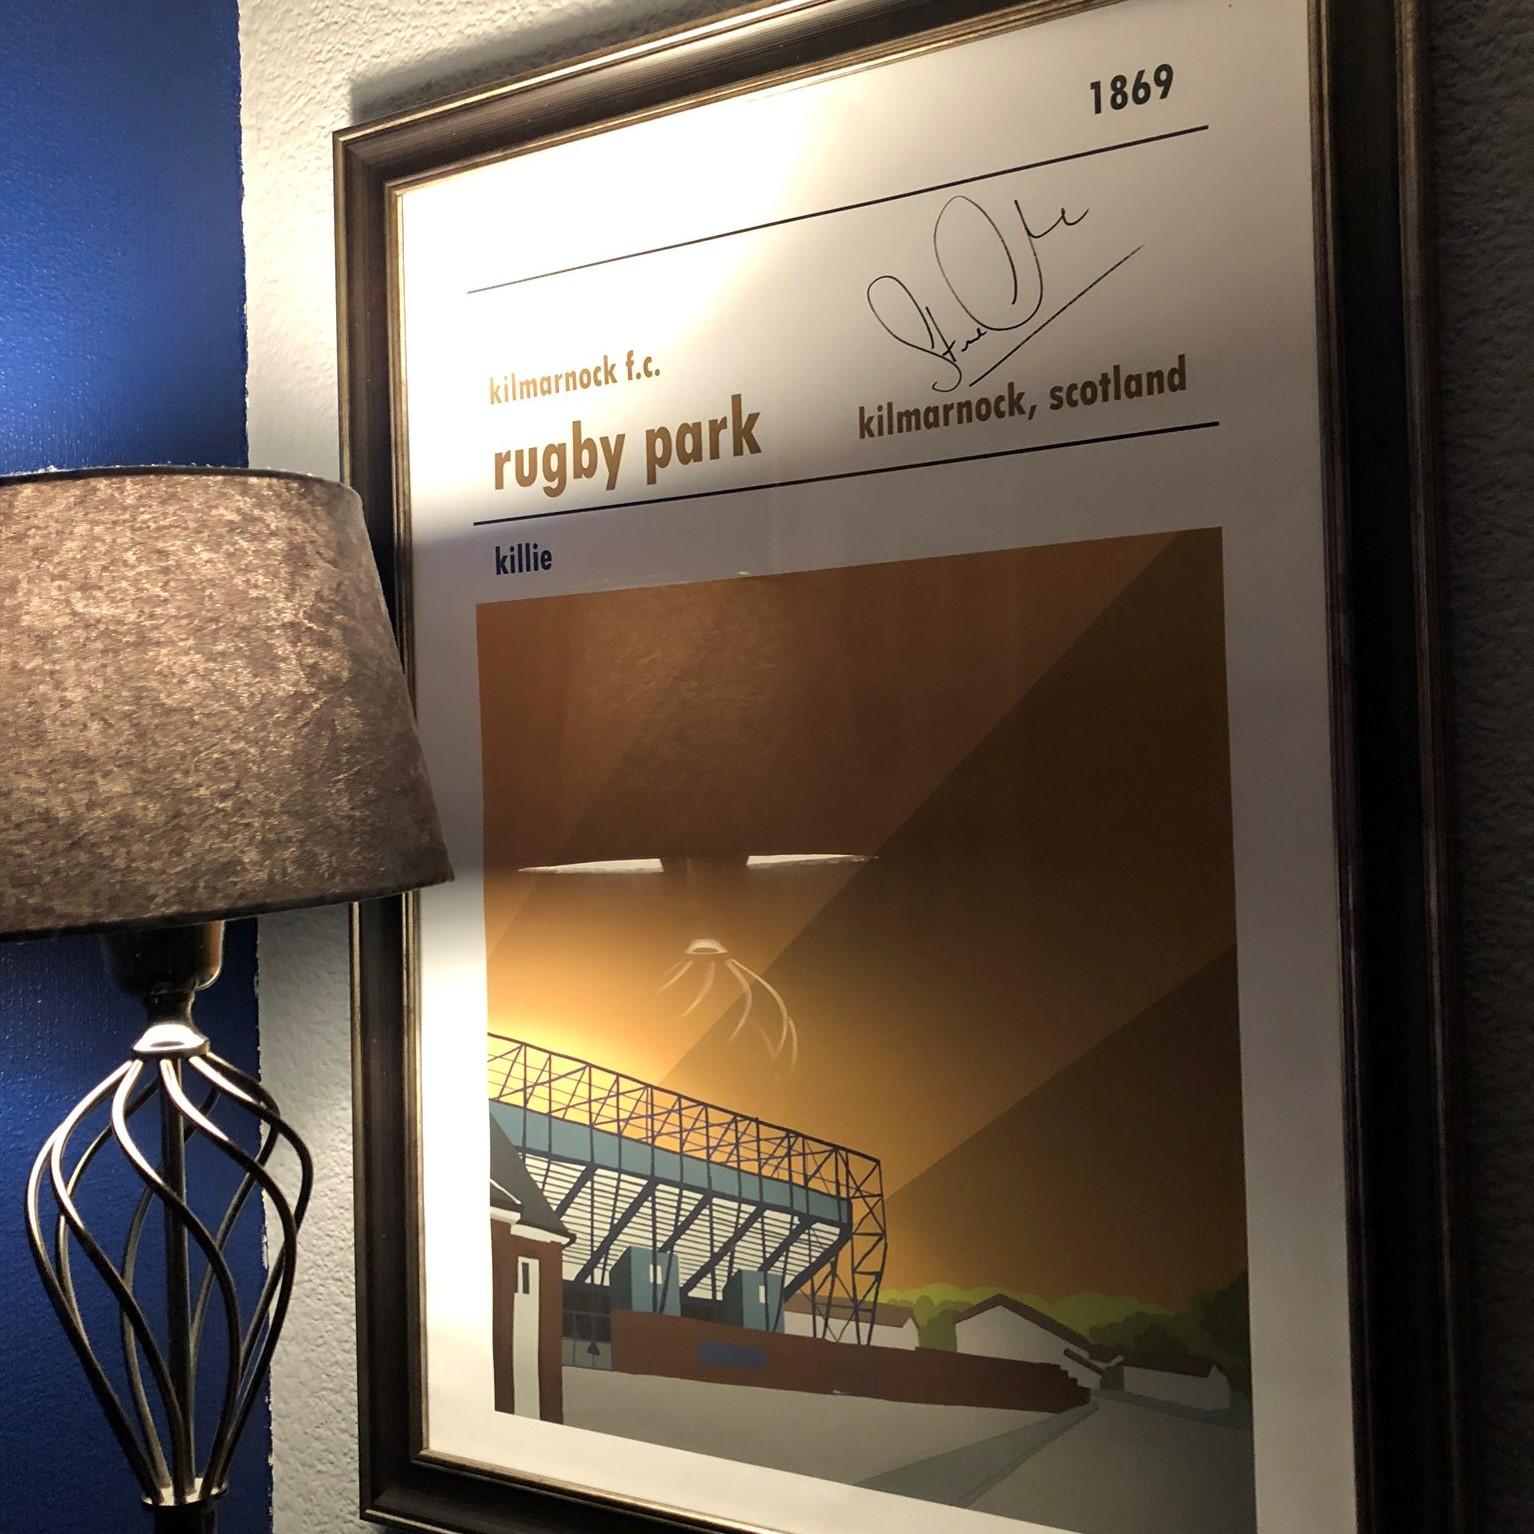 Kilmarnock Football Print signed by Steve Clarke, Scotland Manager